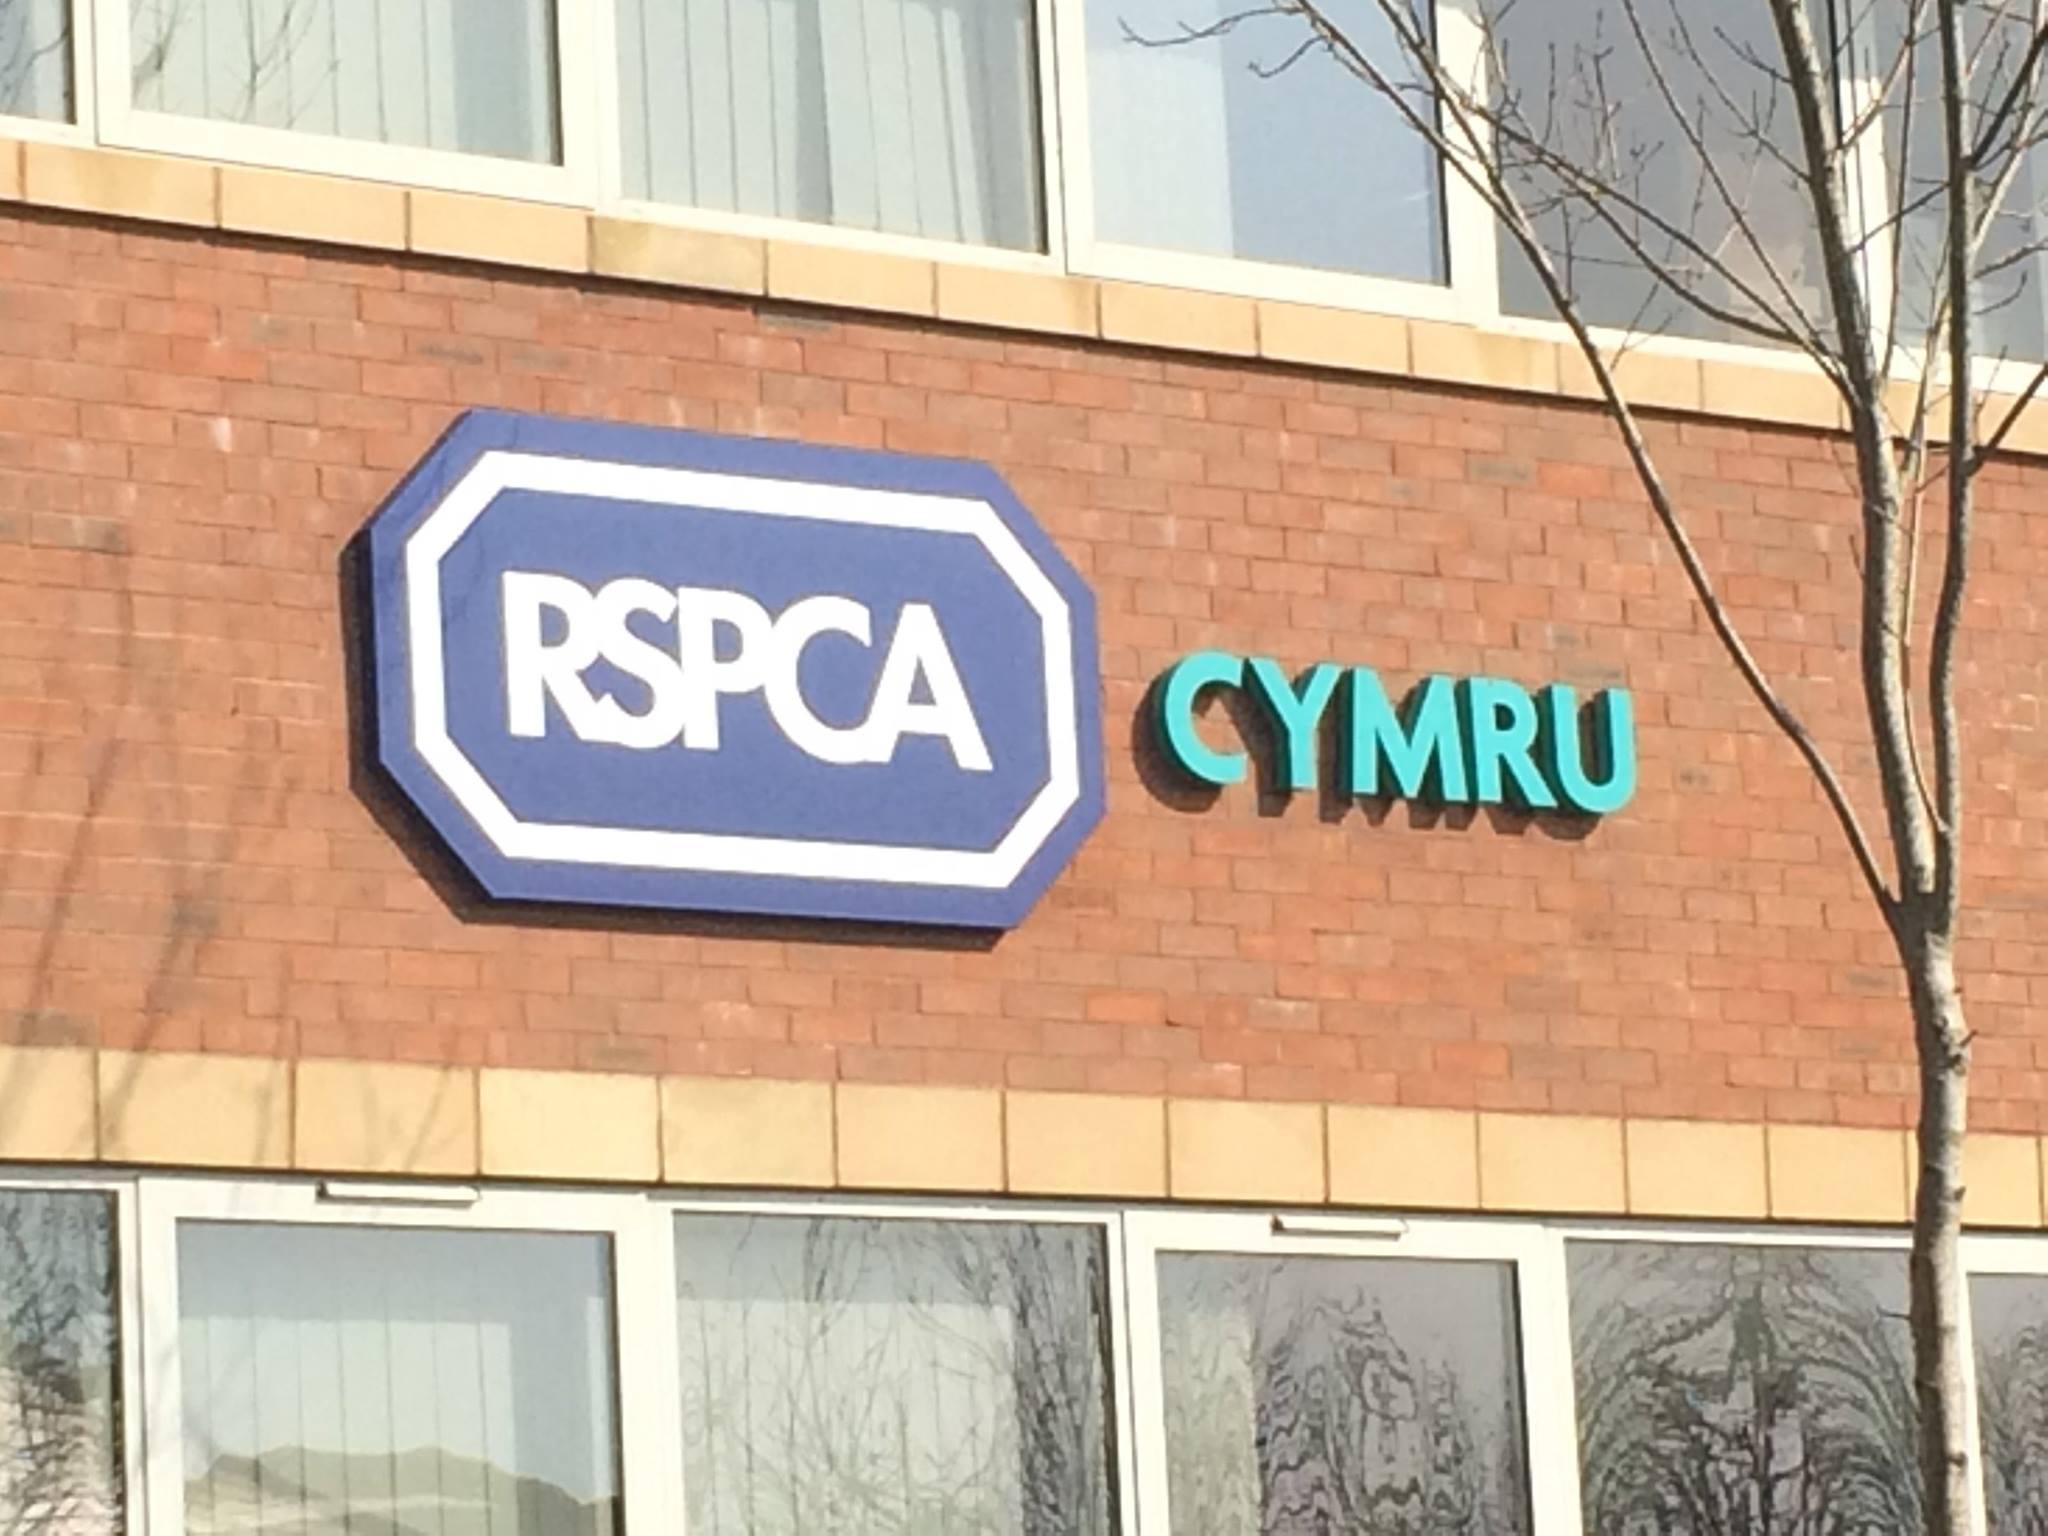 RSPCA-cymru-exterior-sign.jpg